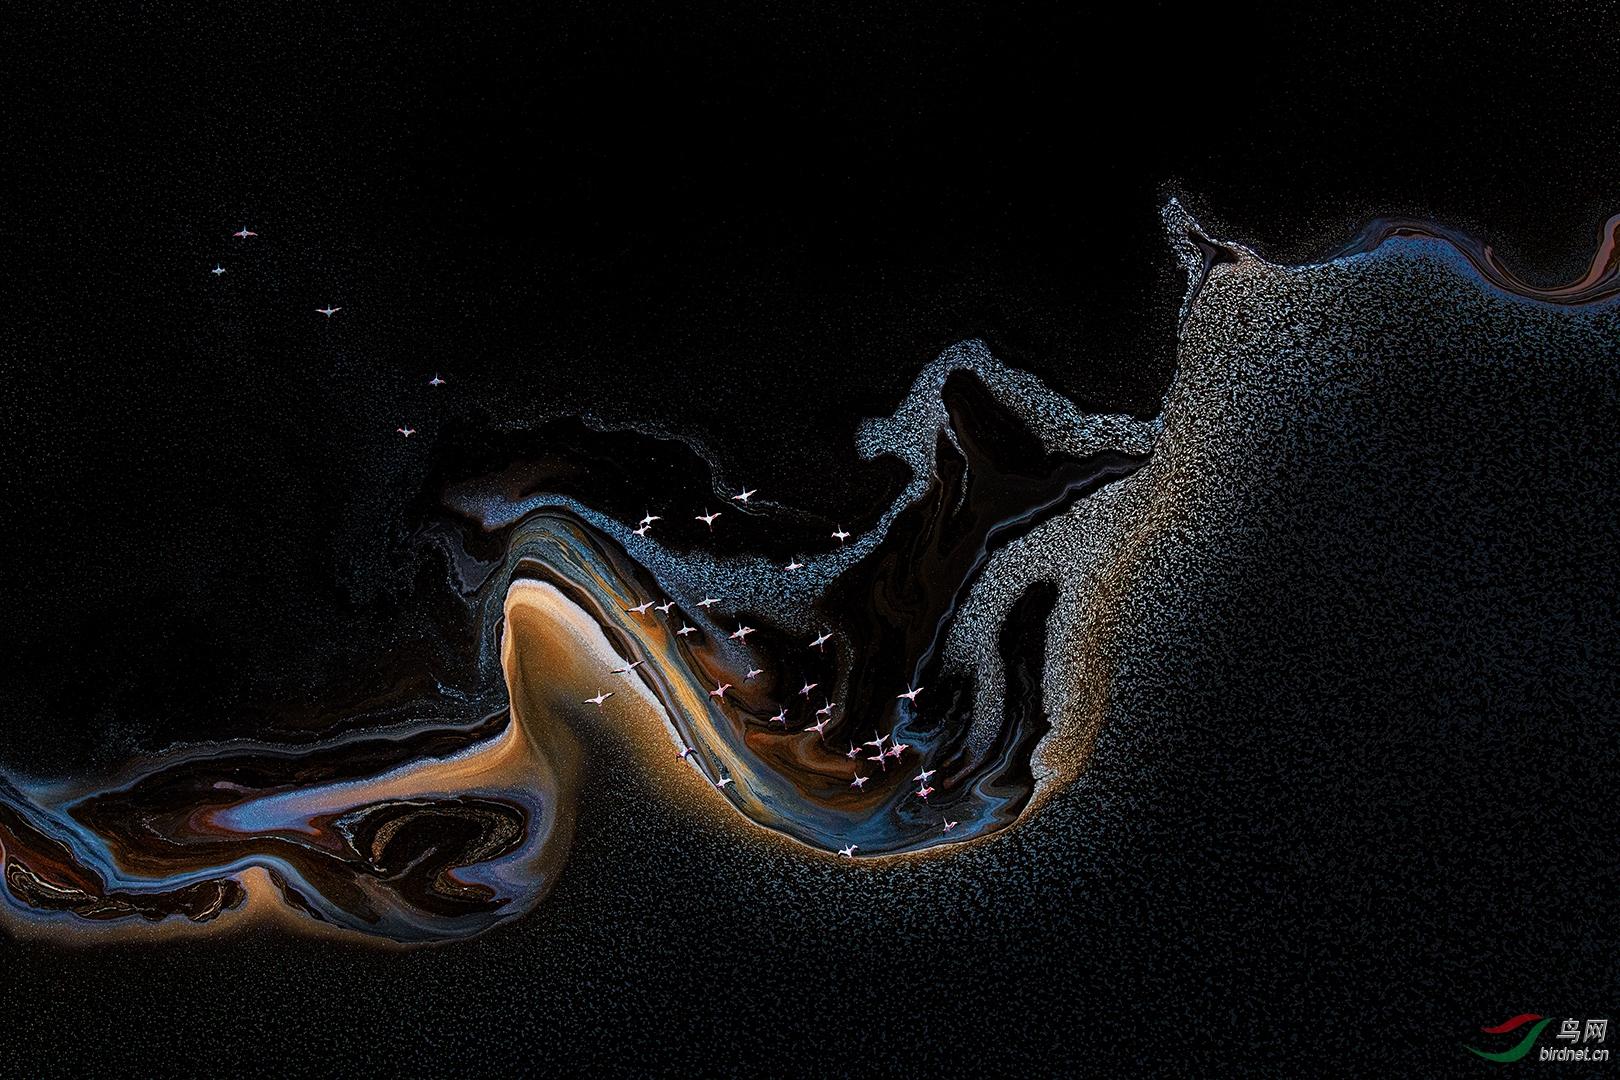 0307. 12087_Flamingoes over Lake Magadi_艺术(画意)摄影.jpg